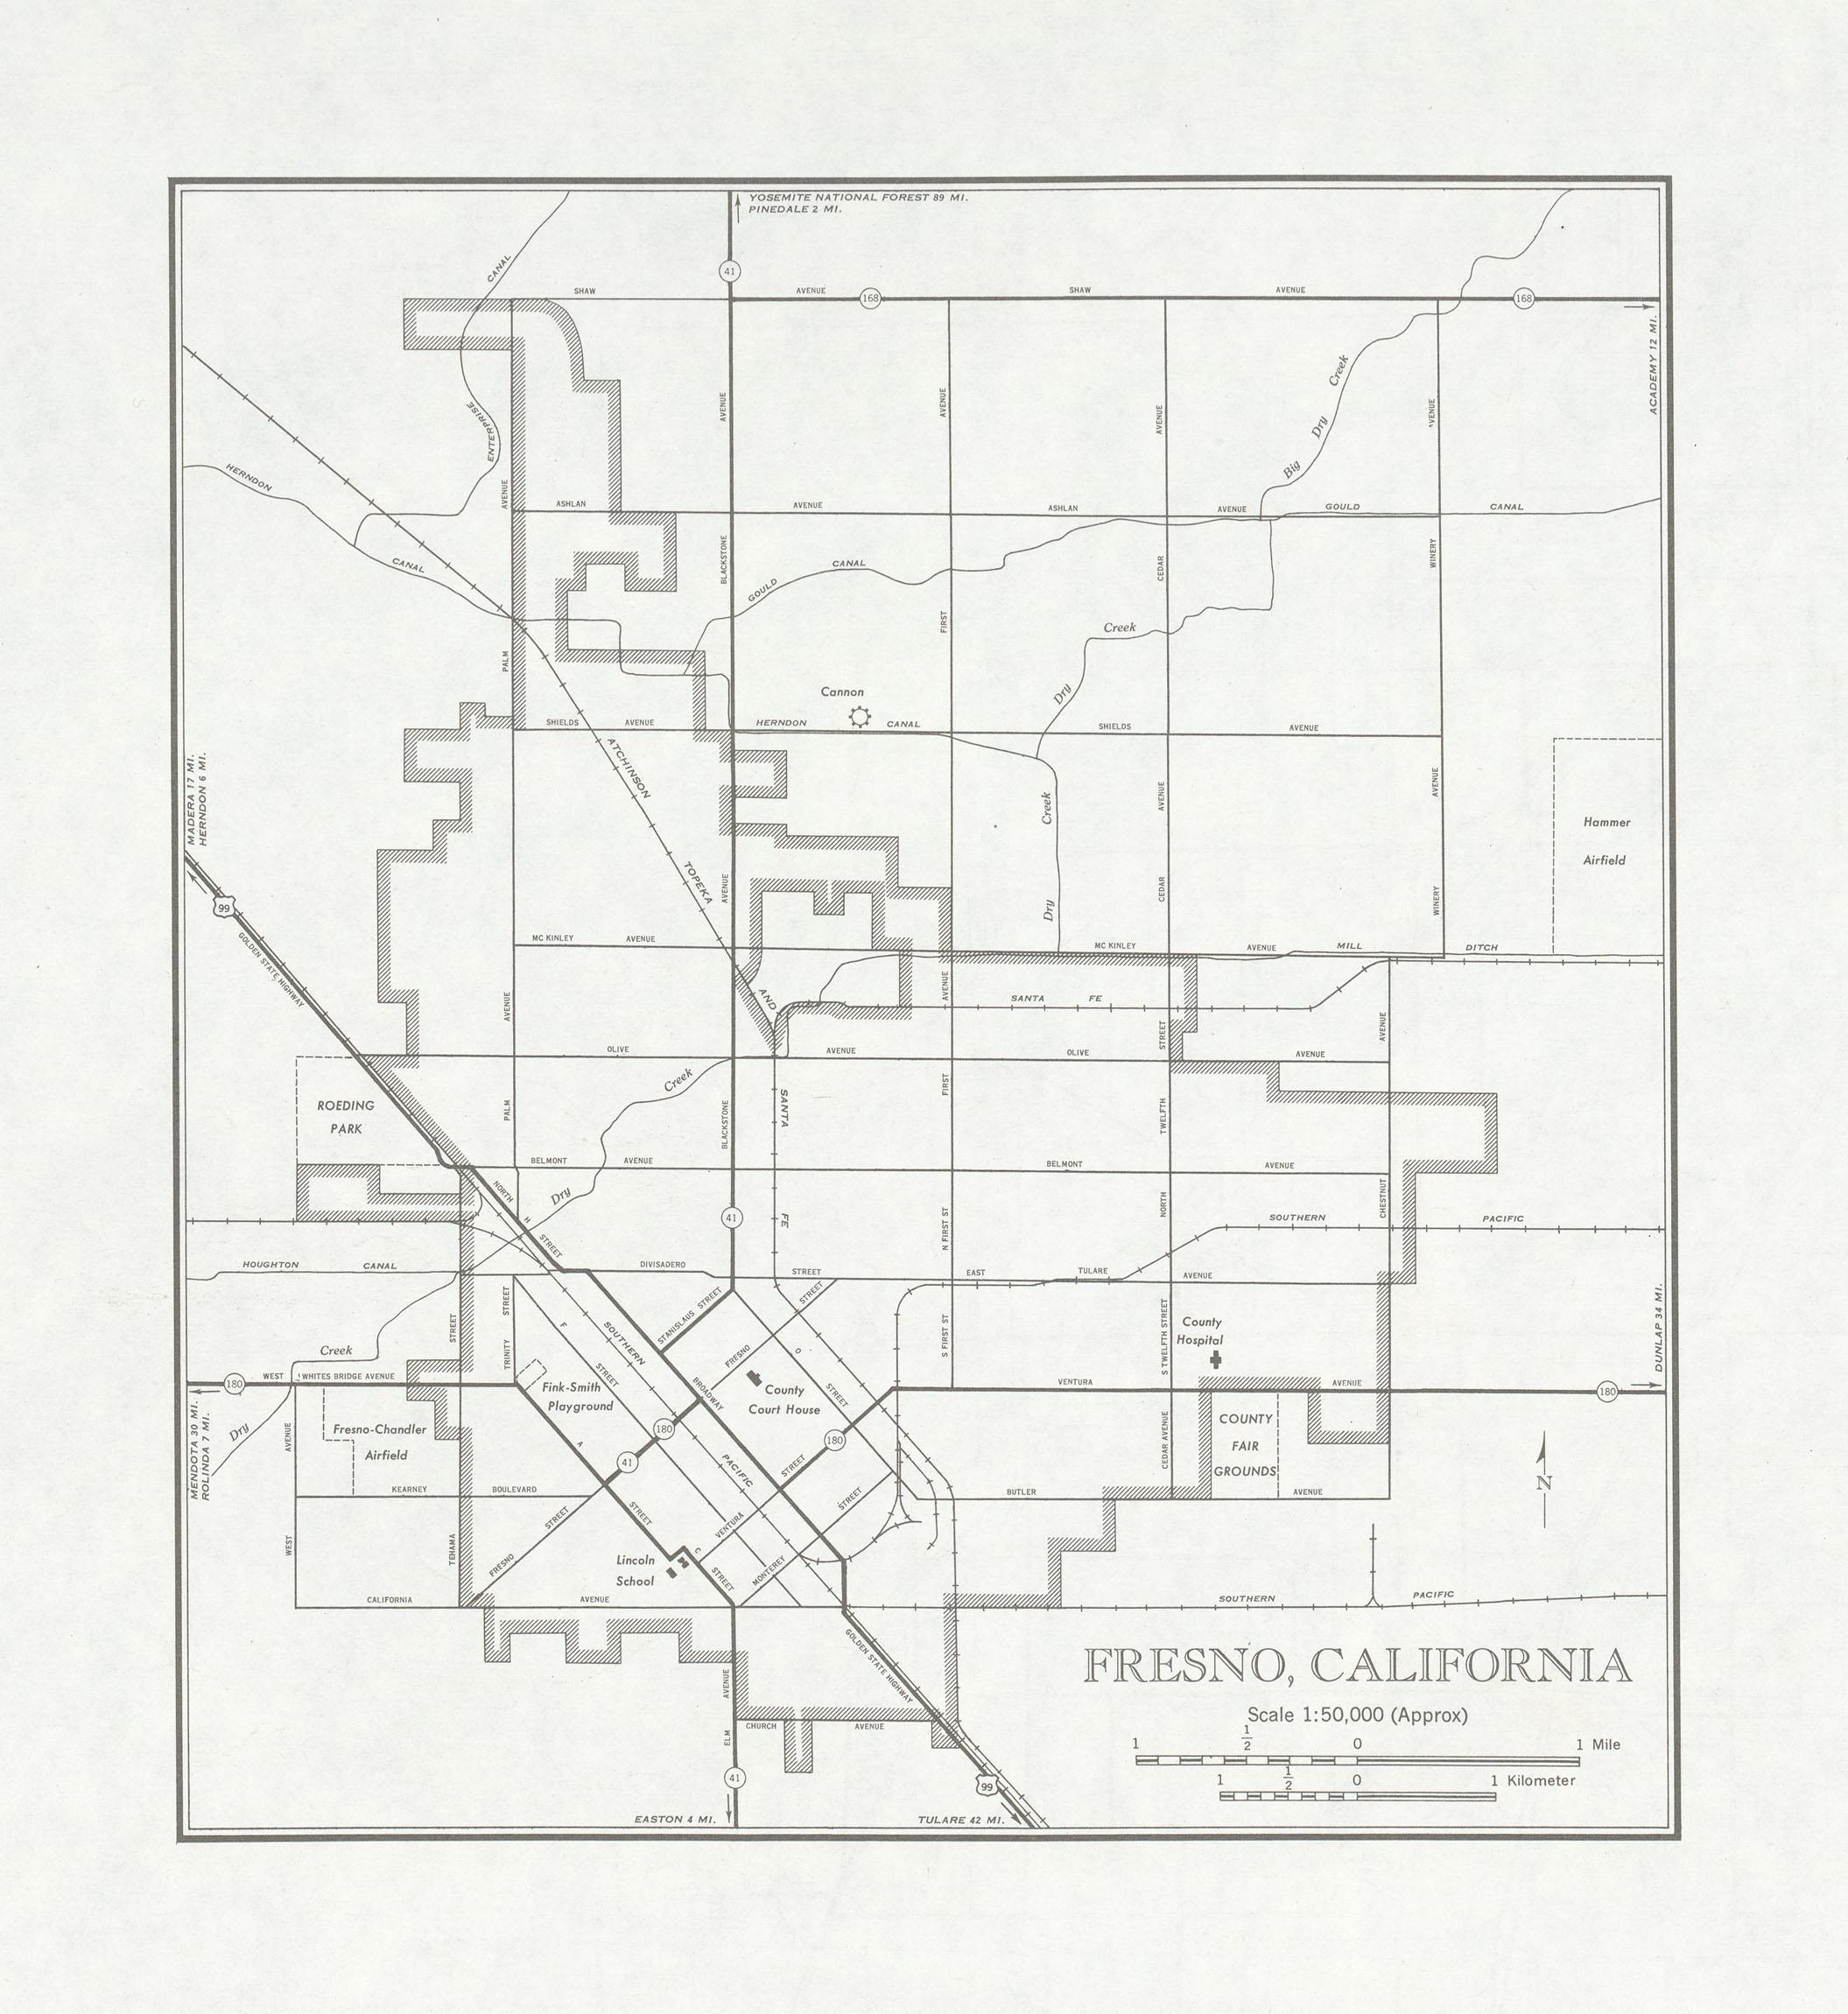 Fresno City Map, California, United States 1947